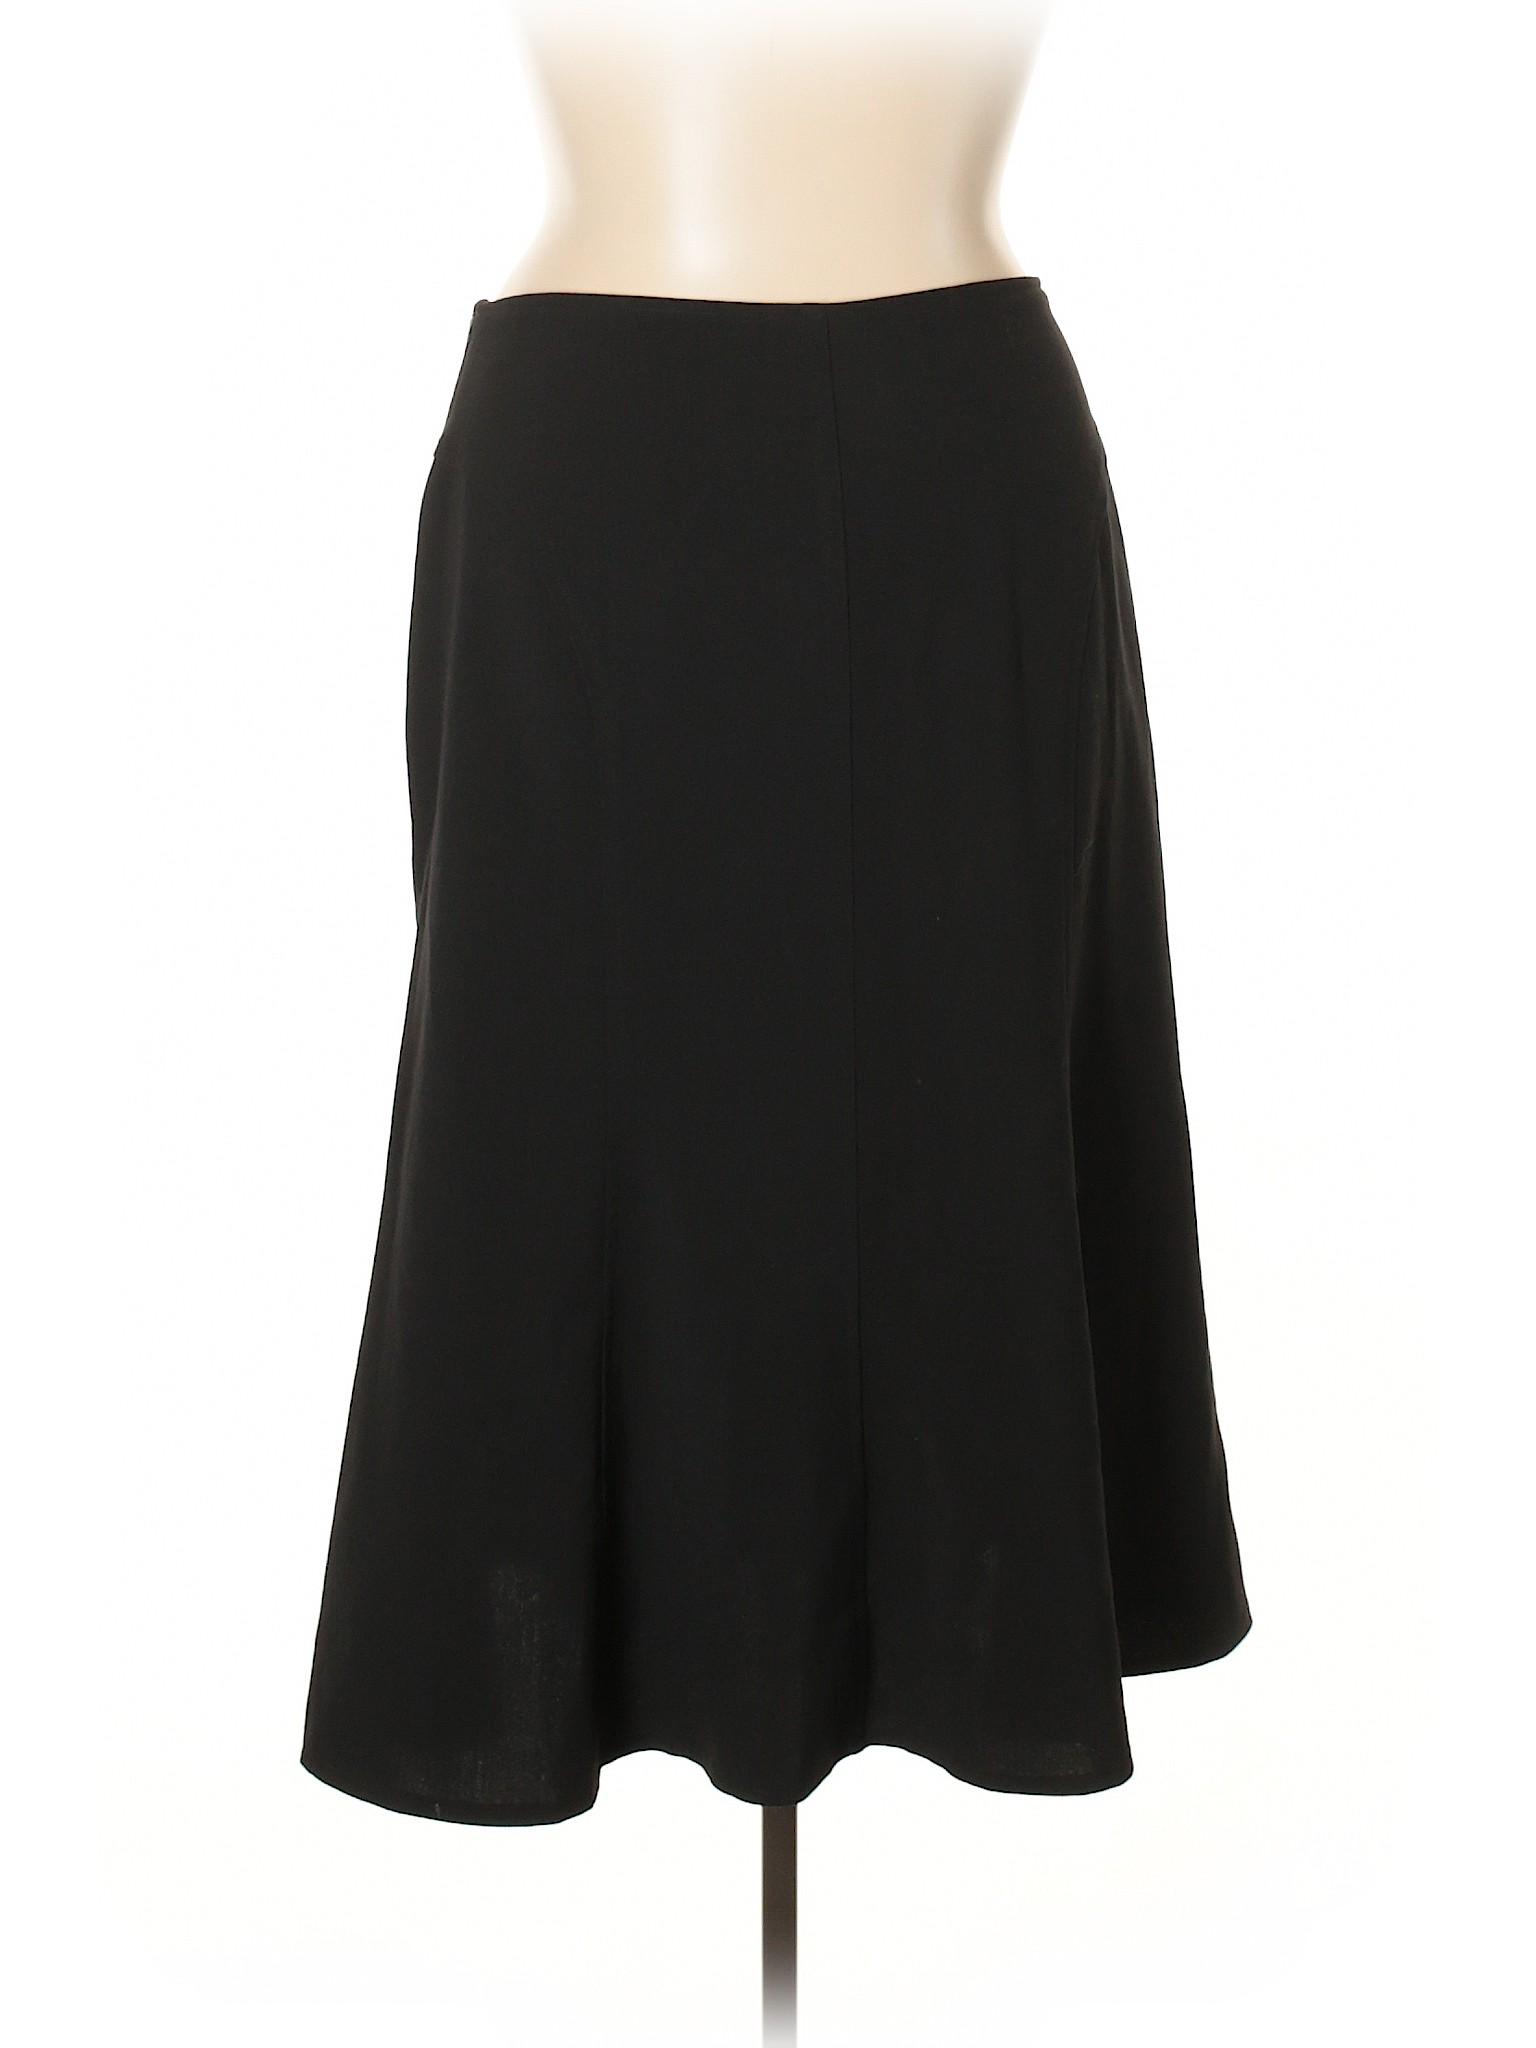 Casual Skirt Boutique DressBarn Boutique leisure leisure I4Ux8z4